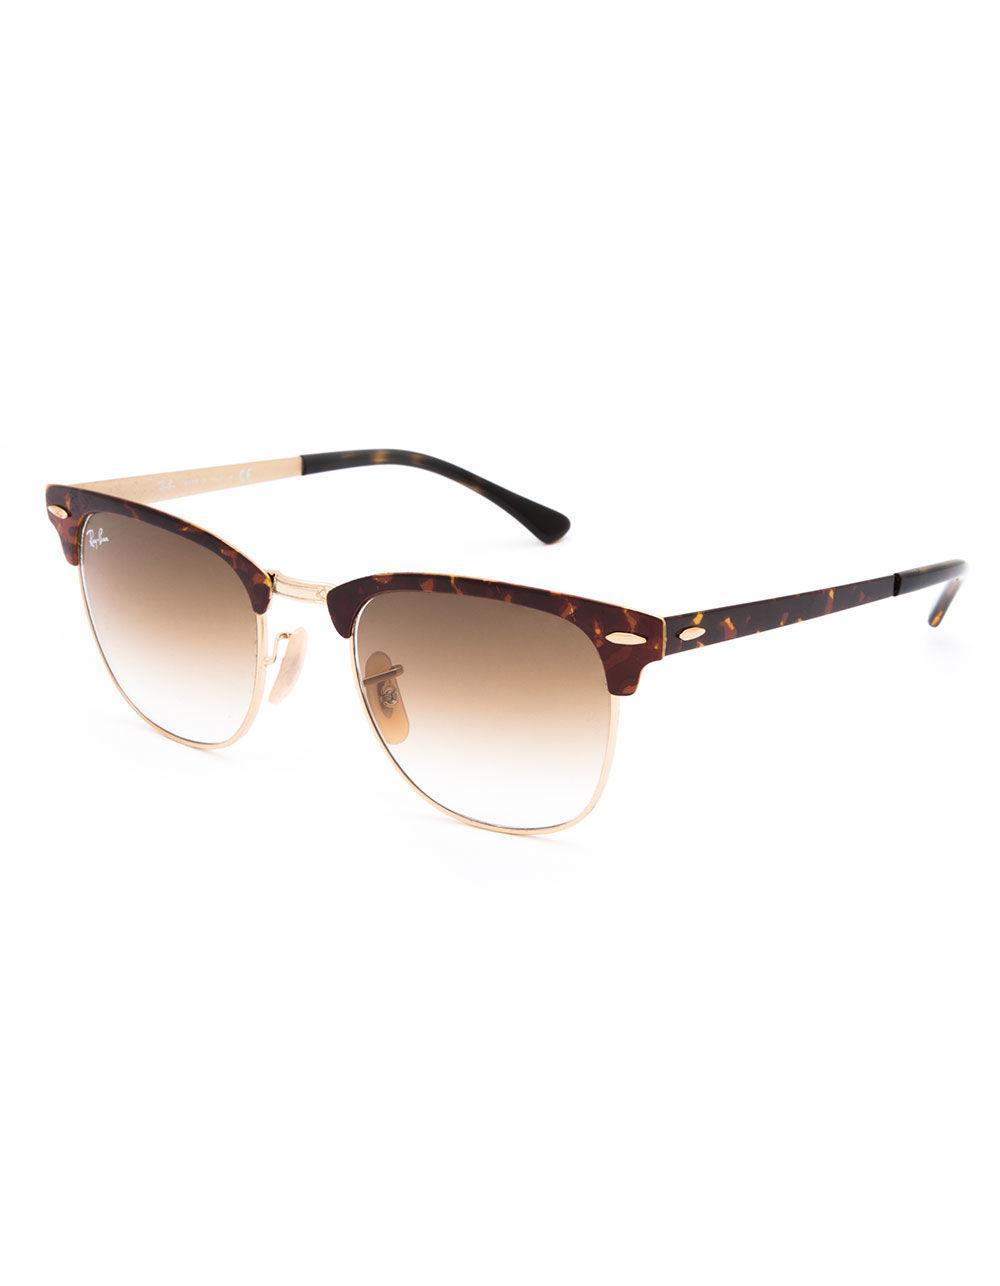 d2b1b1f1c6 Ray-Ban. Women s Clubmaster Metal Tortoise   Light Brown Gradient Sunglasses